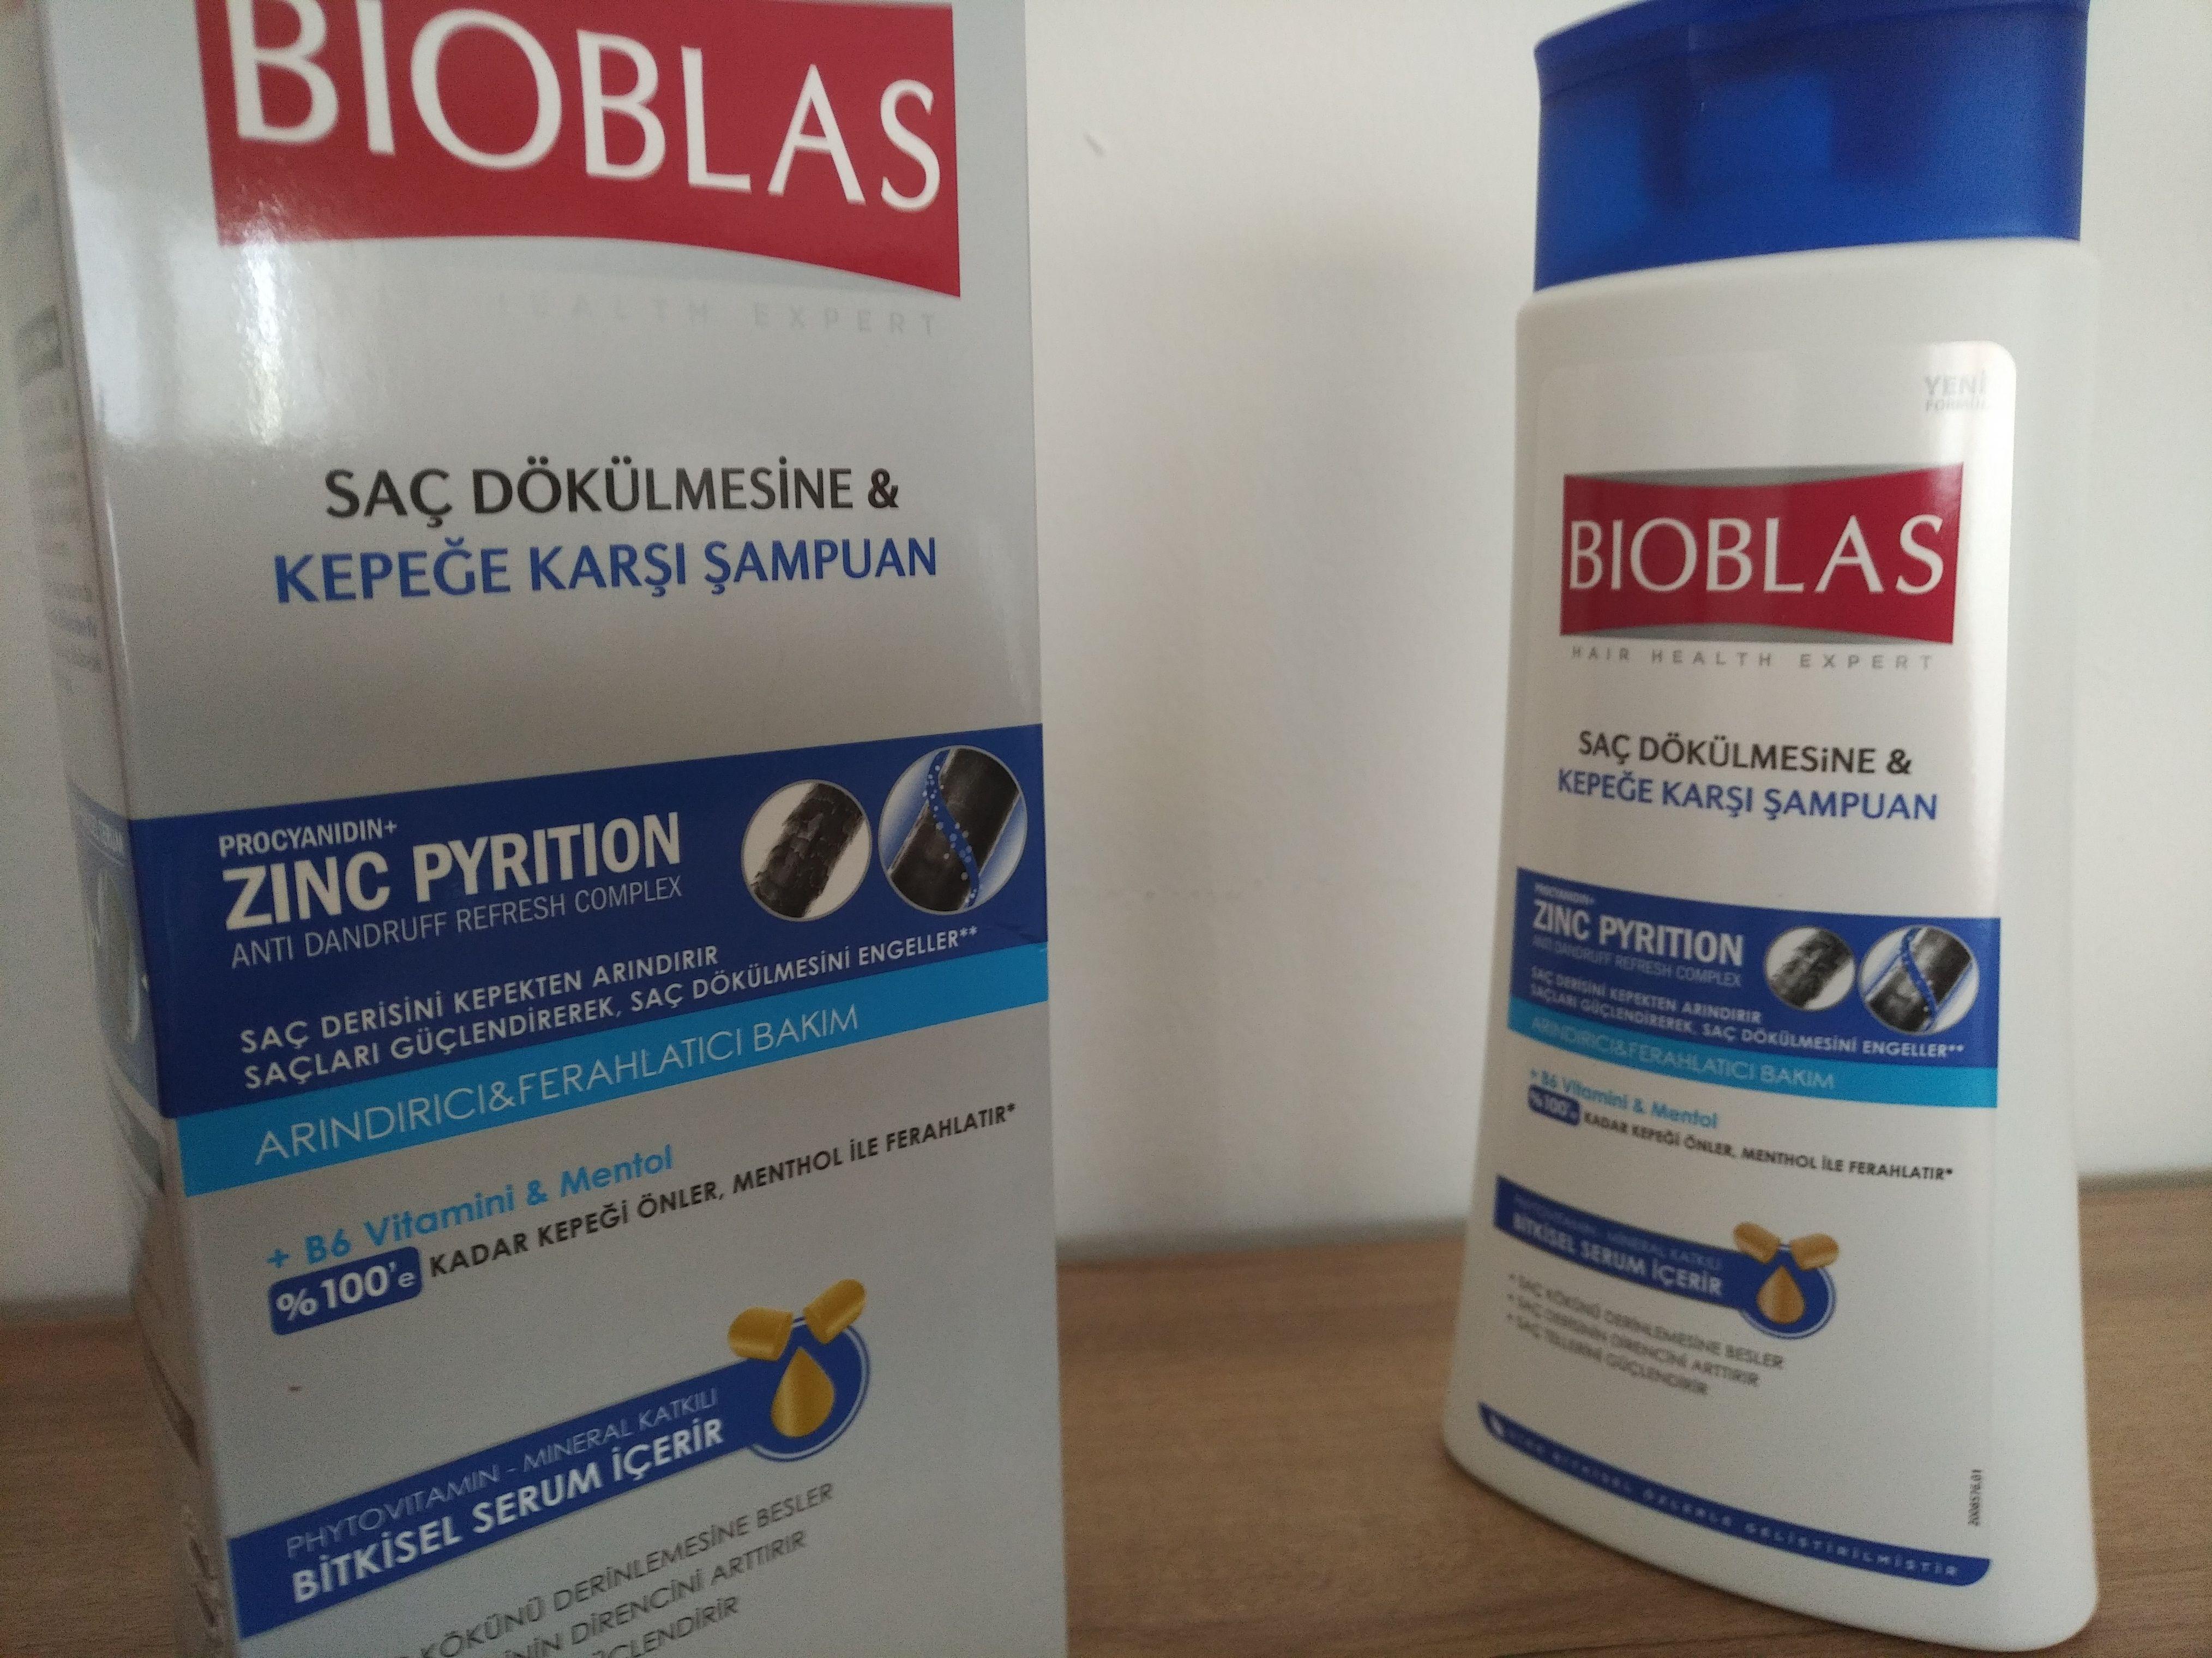 Bioblas Sampuanlarinin Uretildigi Biota Laboratuvarlarinda Sedef